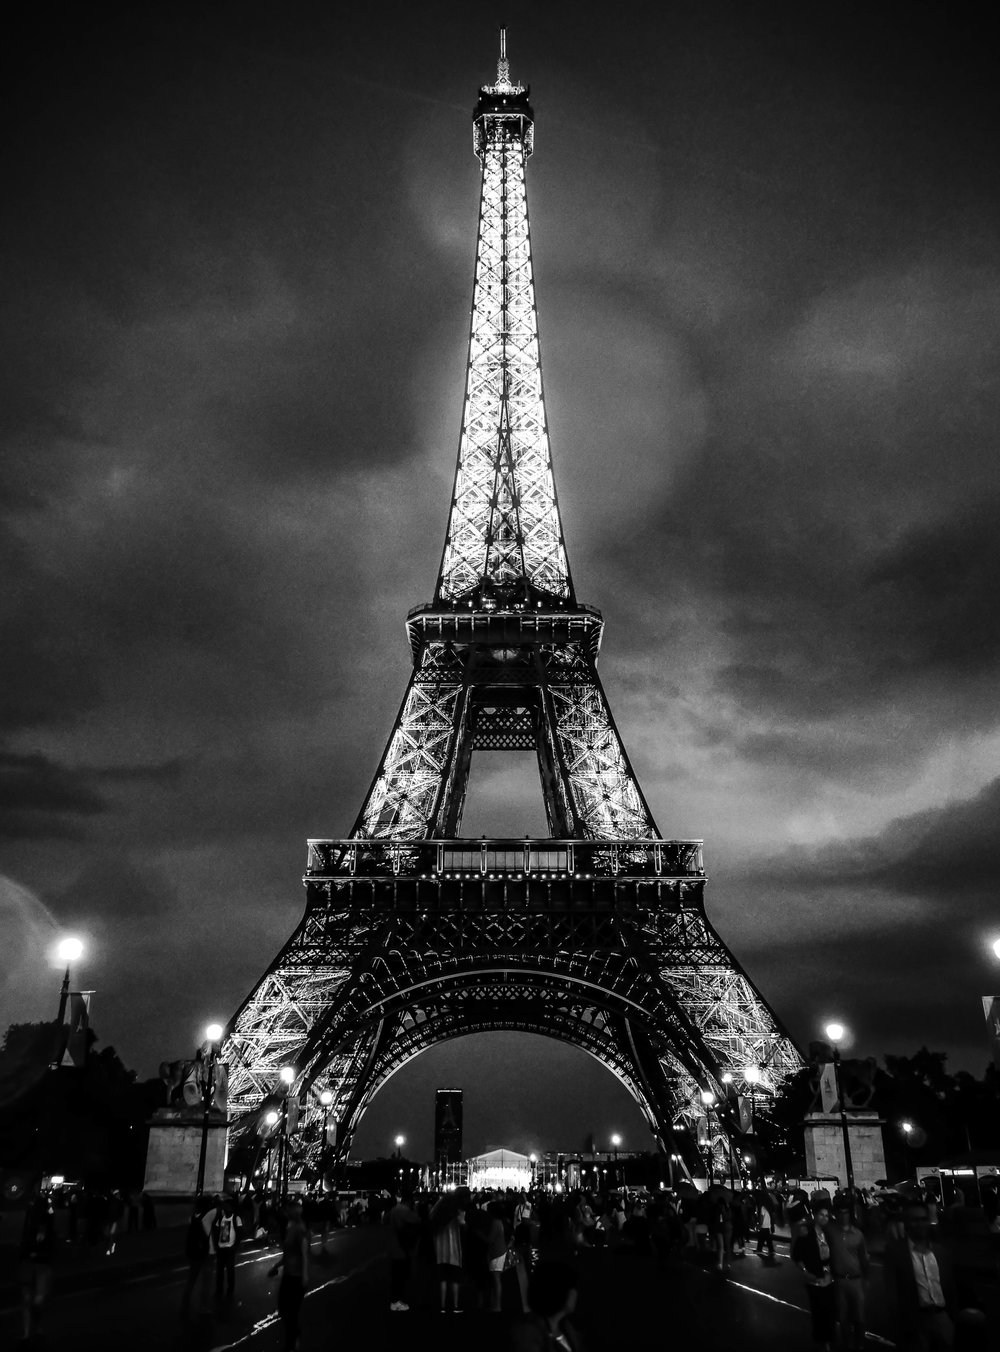 F_DBenstock_Tour Eiffel.jpg